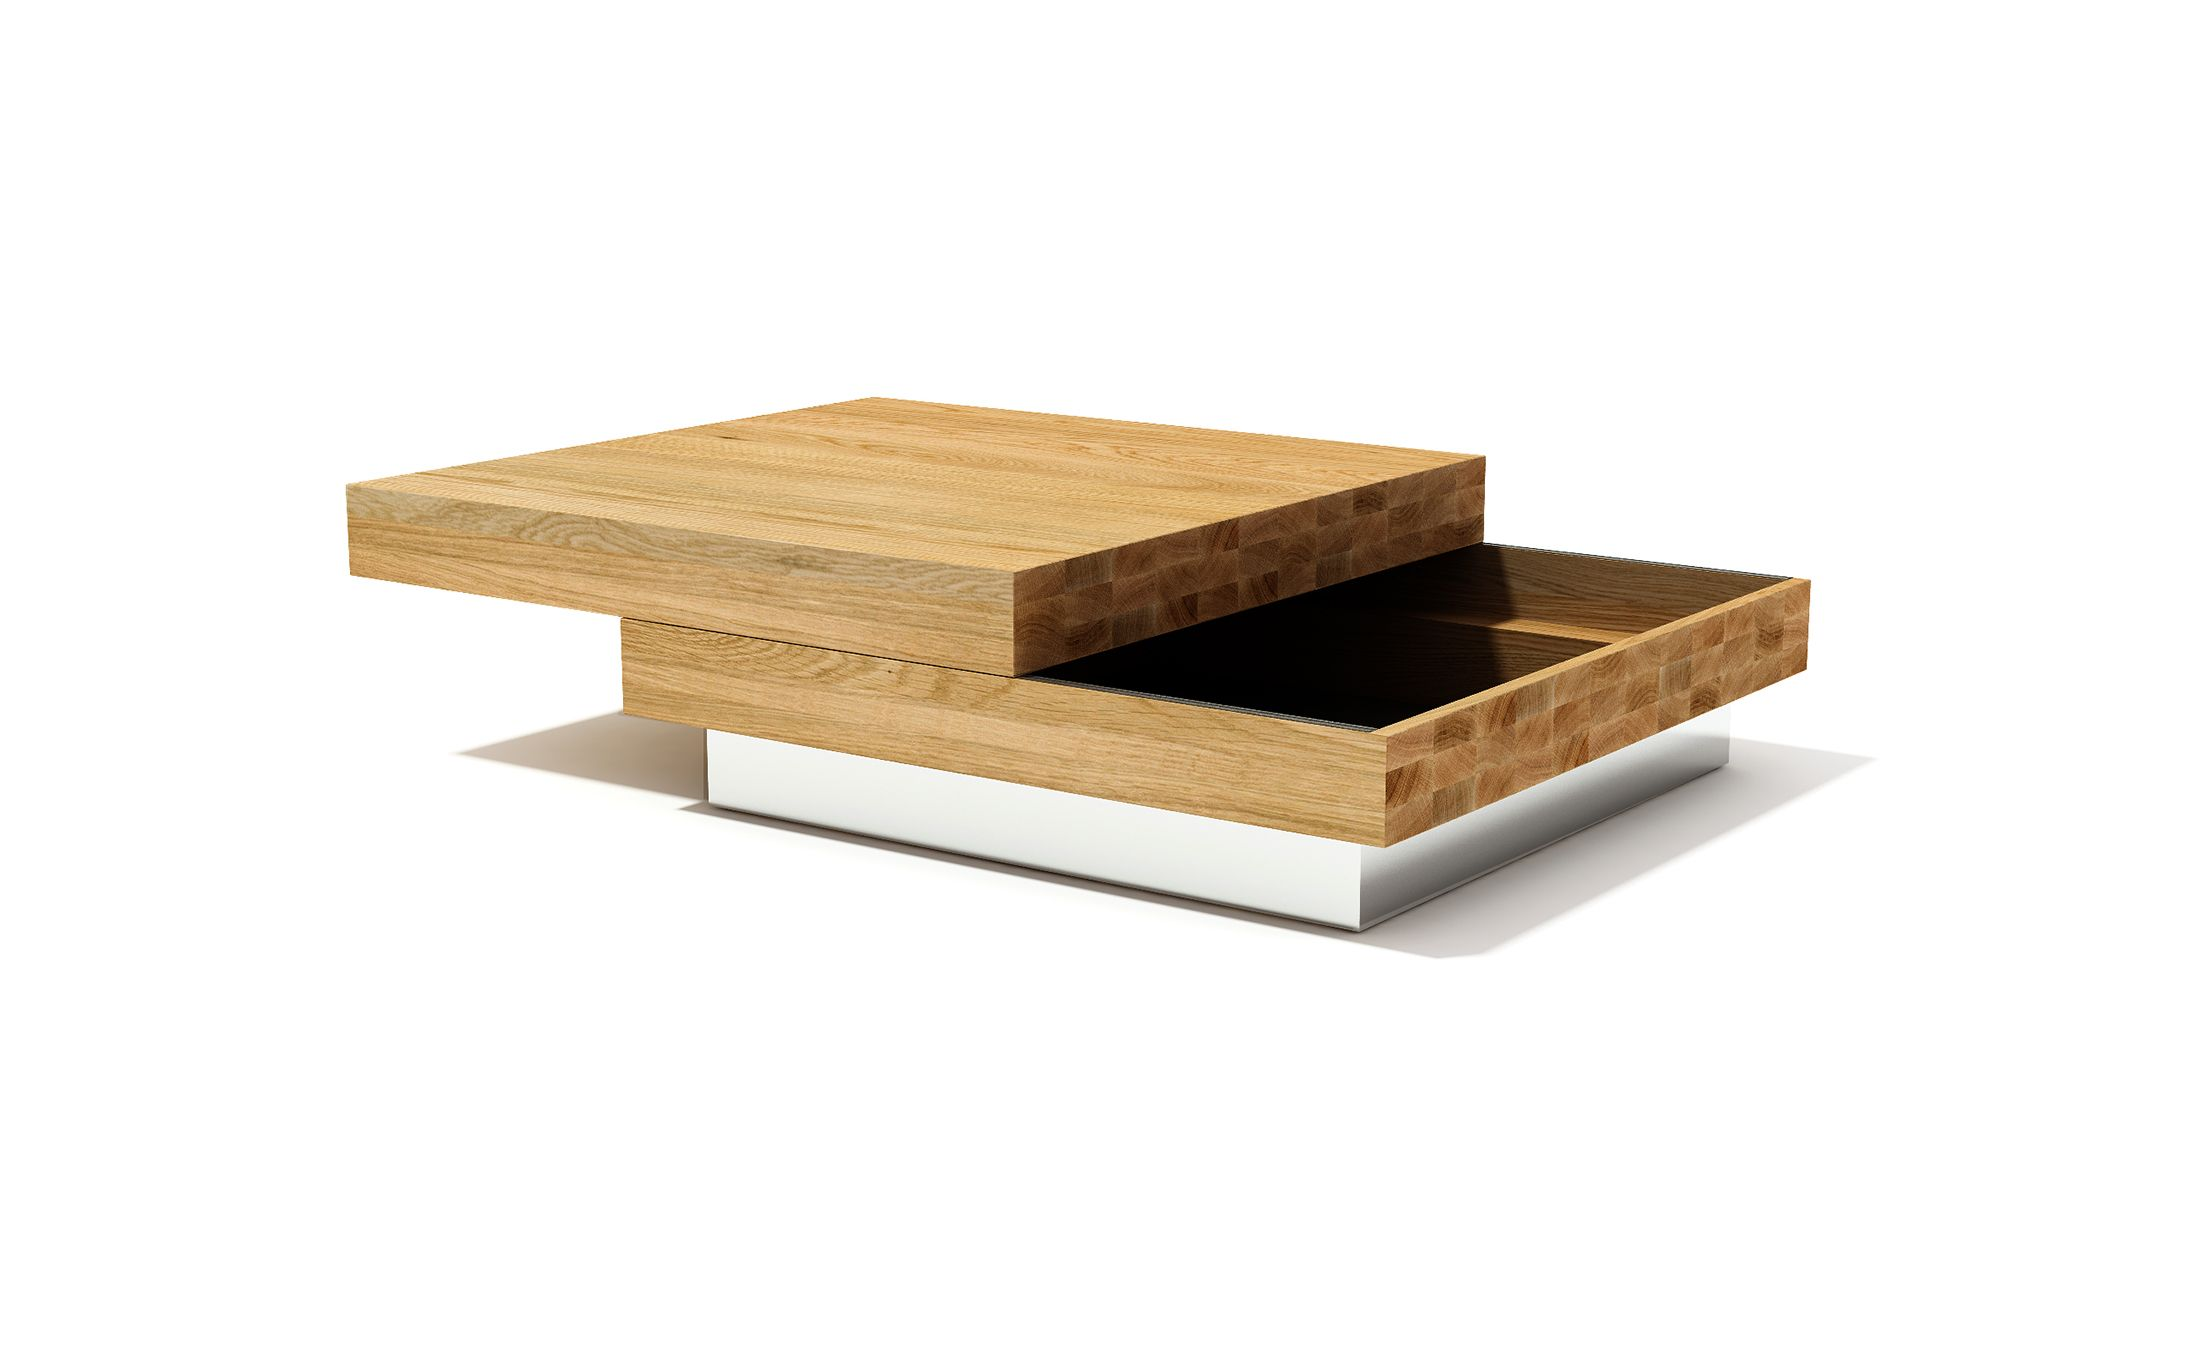 e481ea3b73ee masívny dubový stolík - Nábytok z masívu